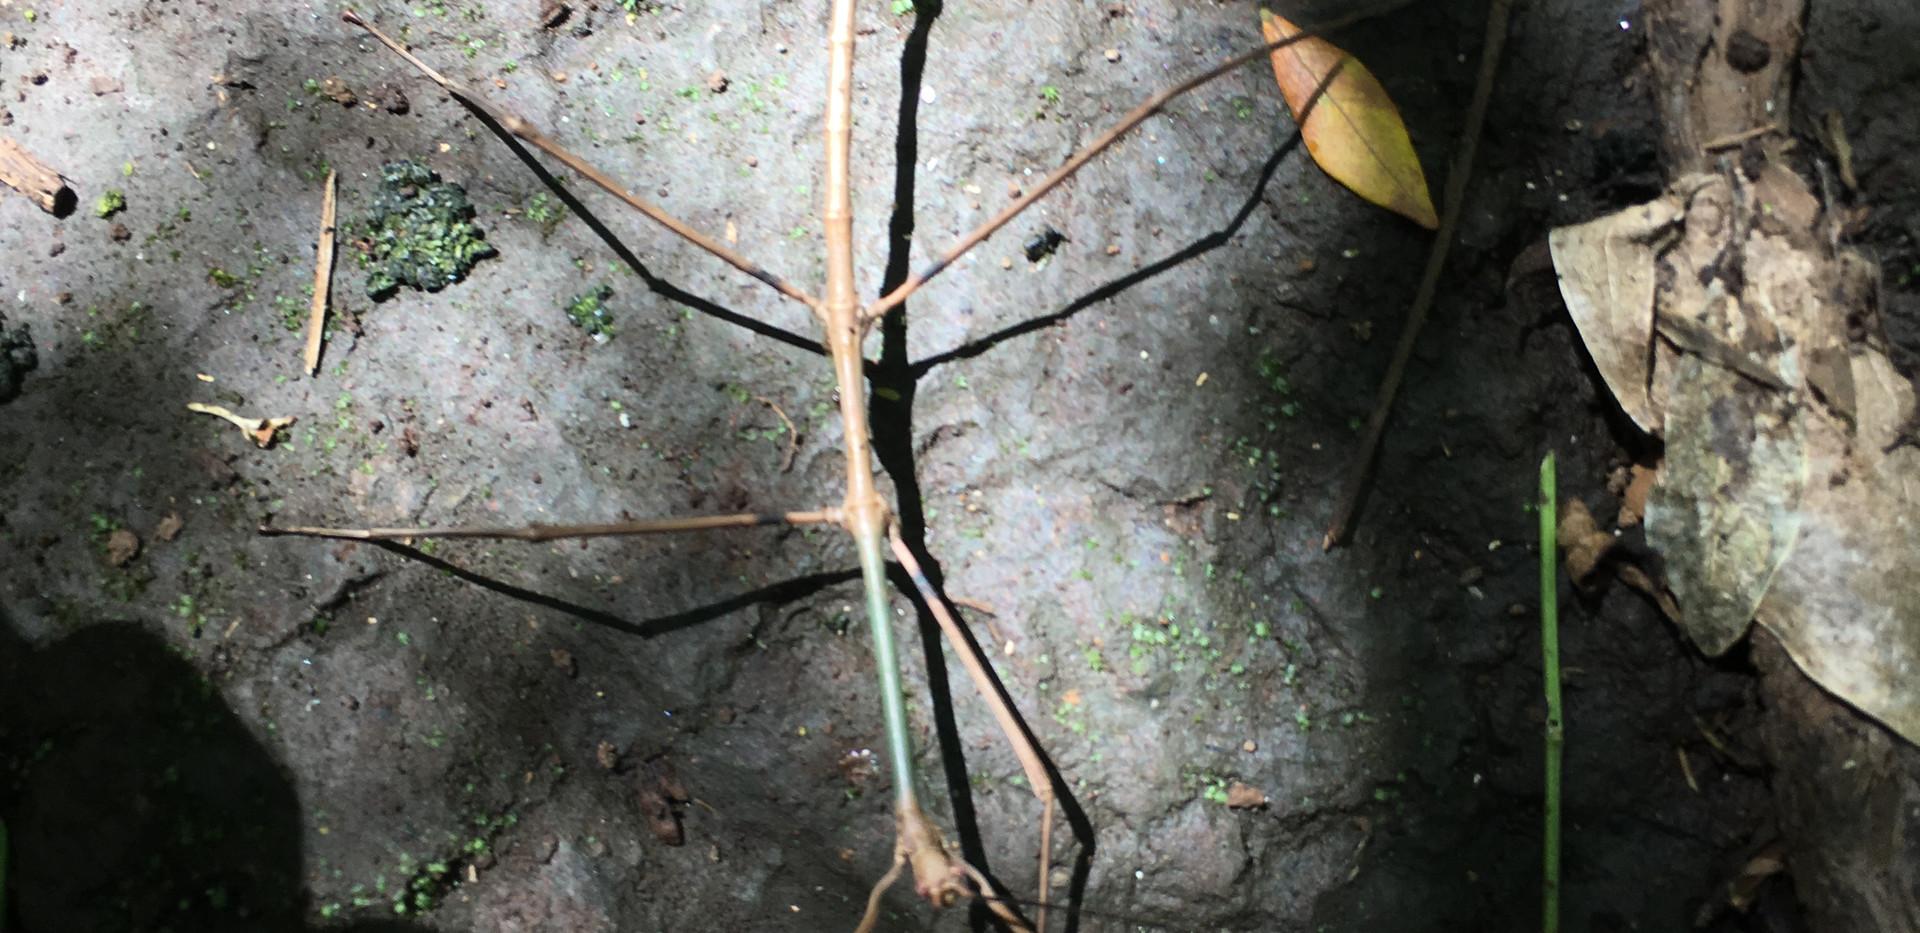 Walking Stick - Costa Rica biodiversity